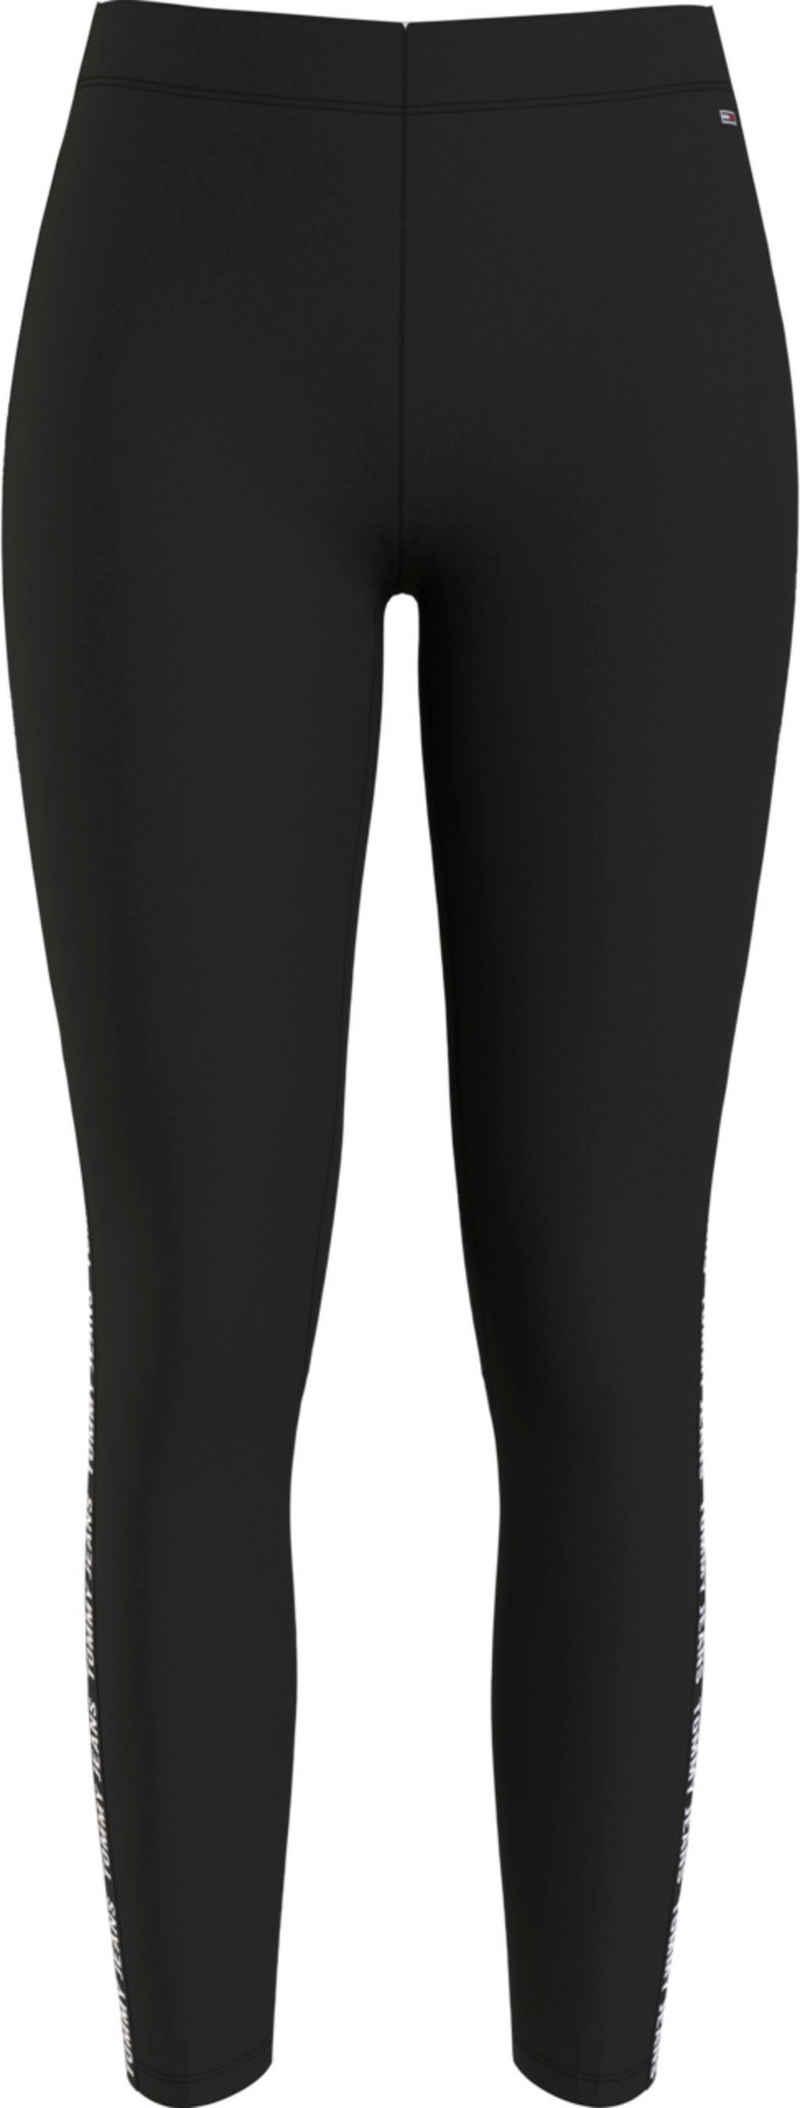 Tommy Jeans Leggings »TJW SKINNY TAPE LEGGINGS« mit Tommy Jeans Logo-Schriftzug seitlich am Bein